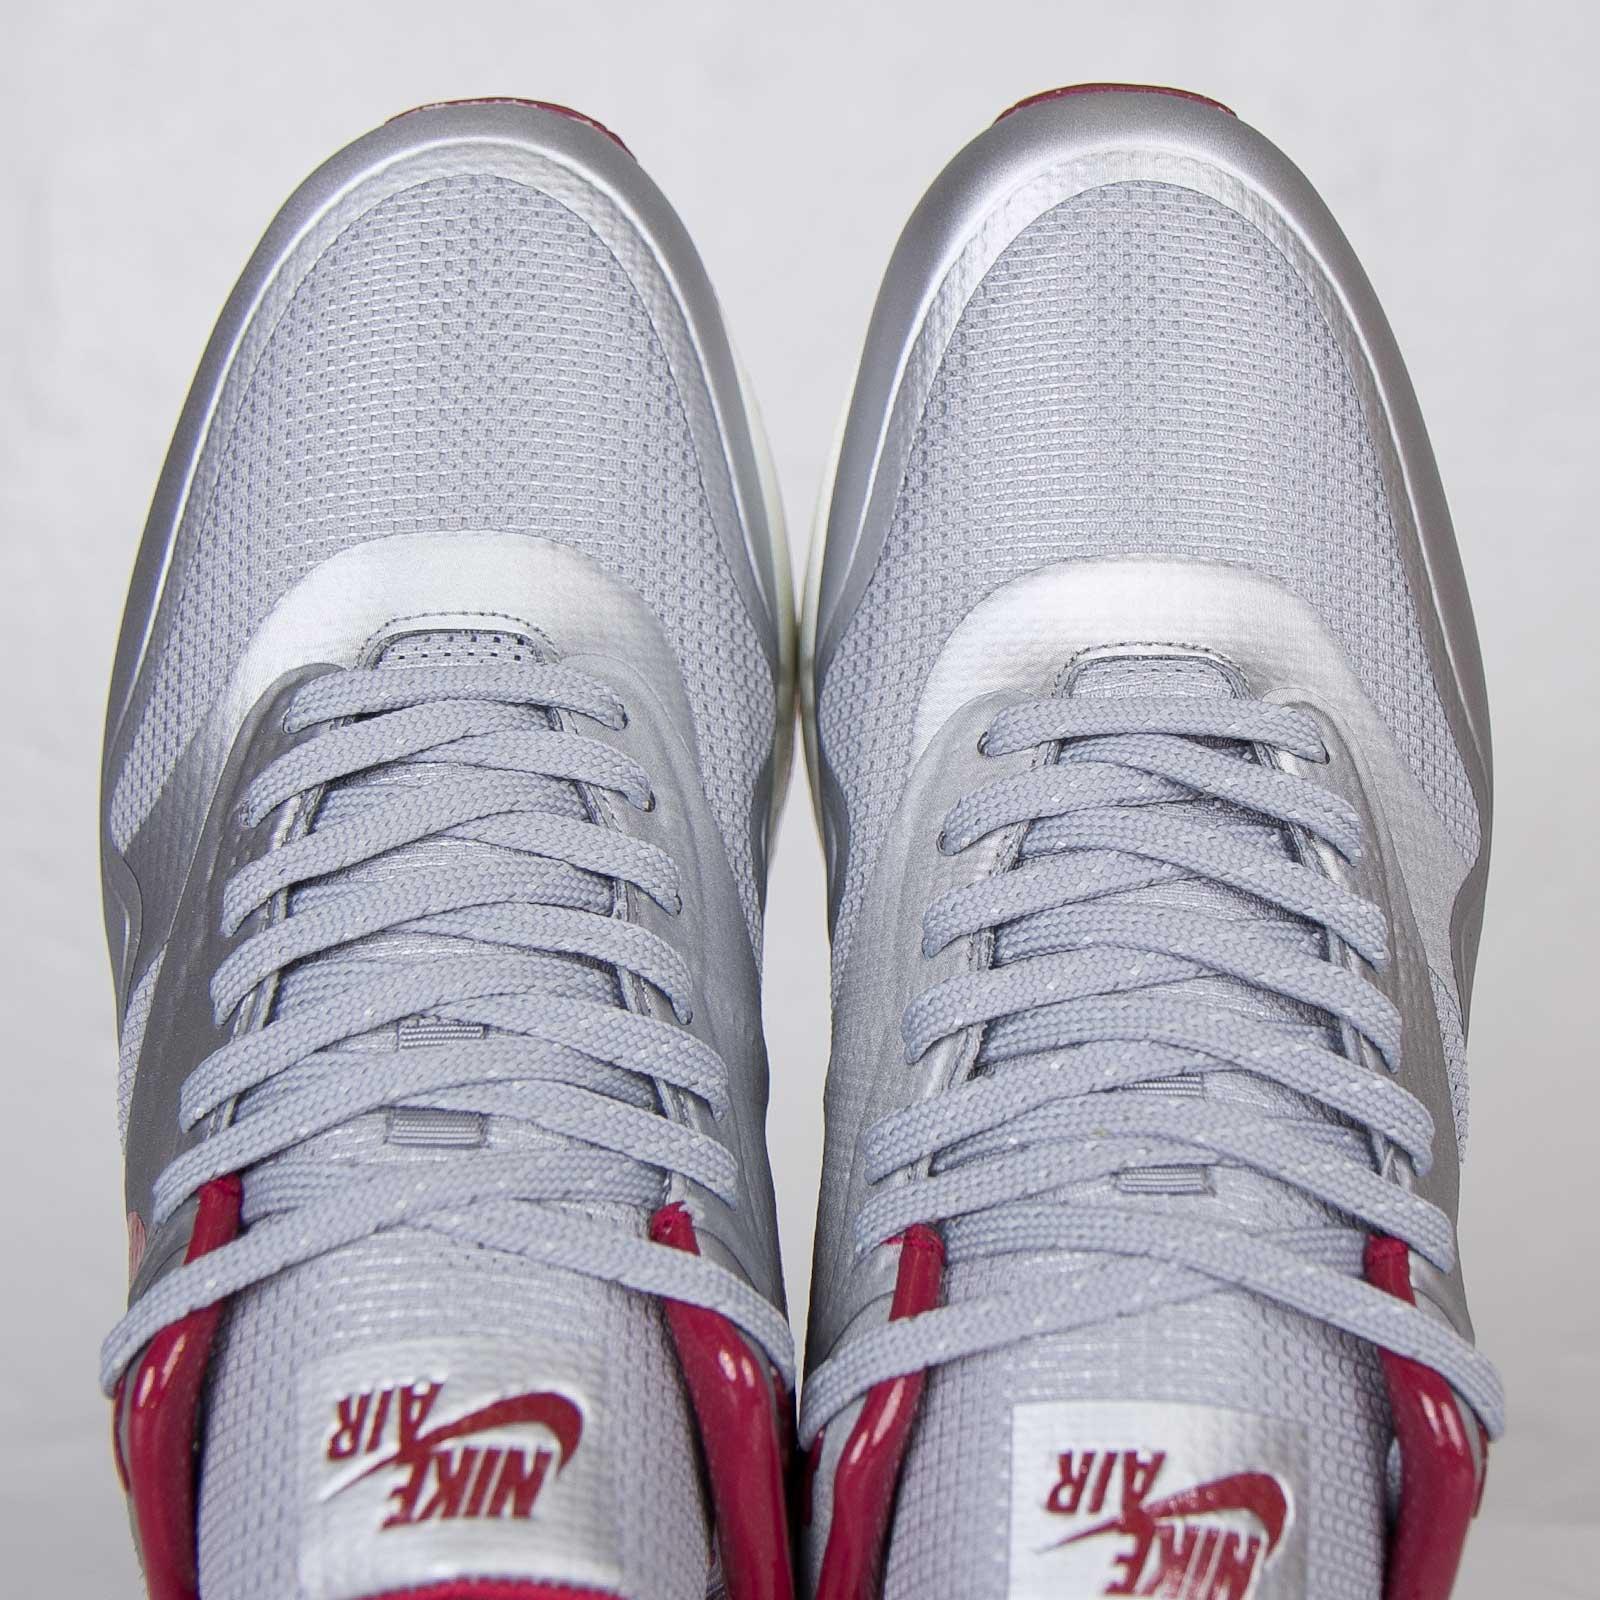 Max sneakers QS 1 Hyp Nike Air Sneakersnstuff 633087 Nike 006 azqRfZE